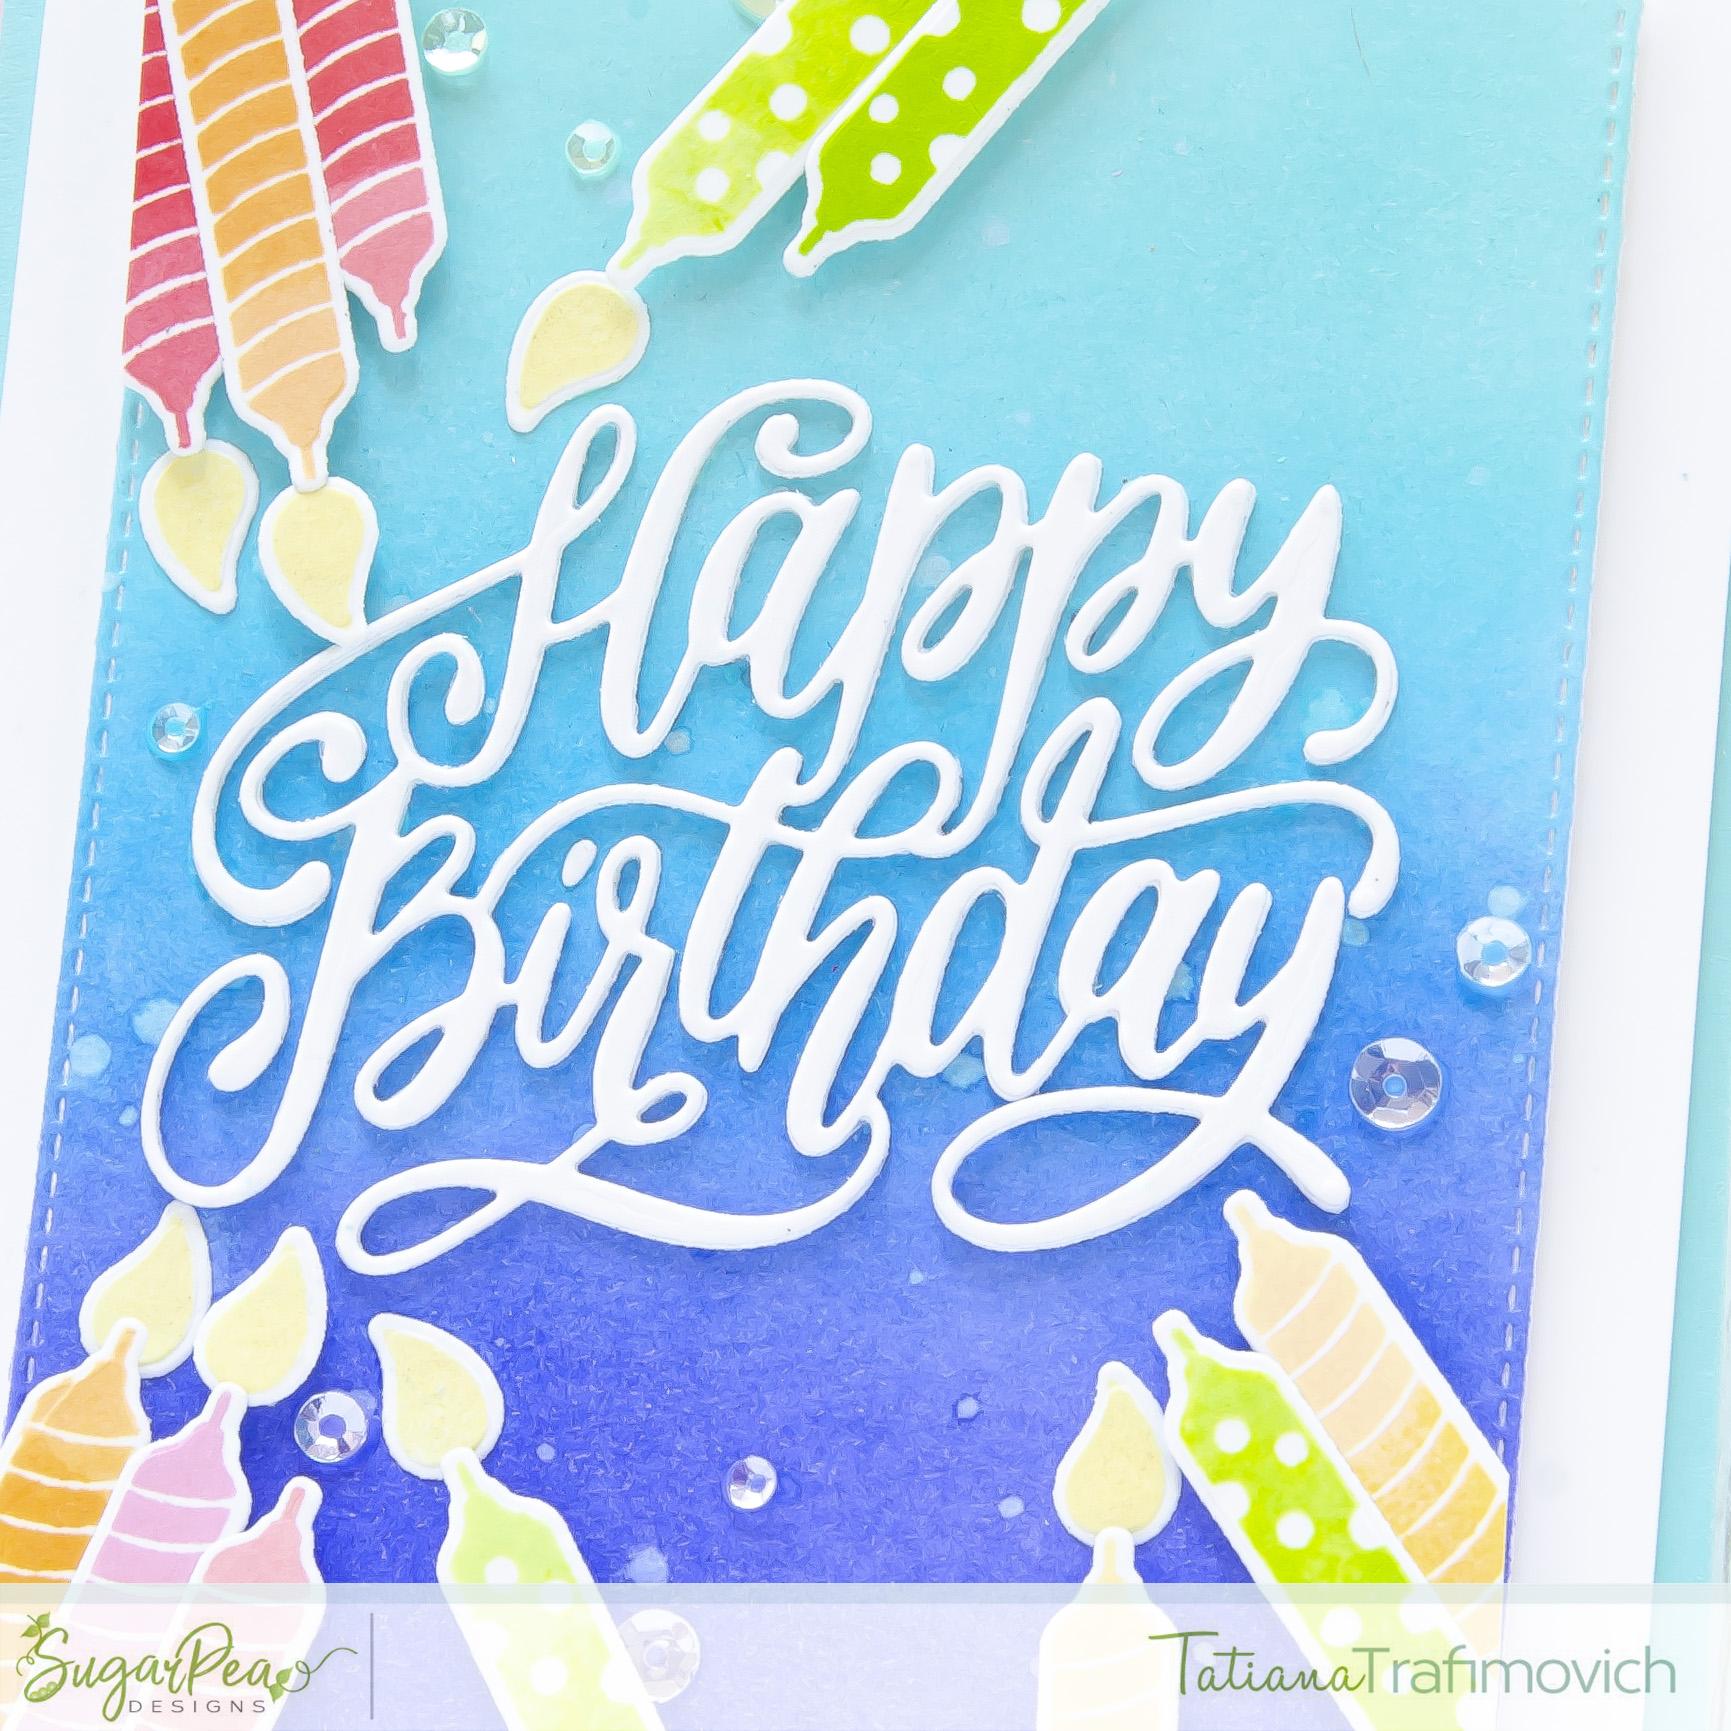 Happy Birthday #handmade card by Tatiana Trafimovich #tatianacraftandart - Birthday Wishes stamp set by SugarPea Designs #sugarpeadesigns